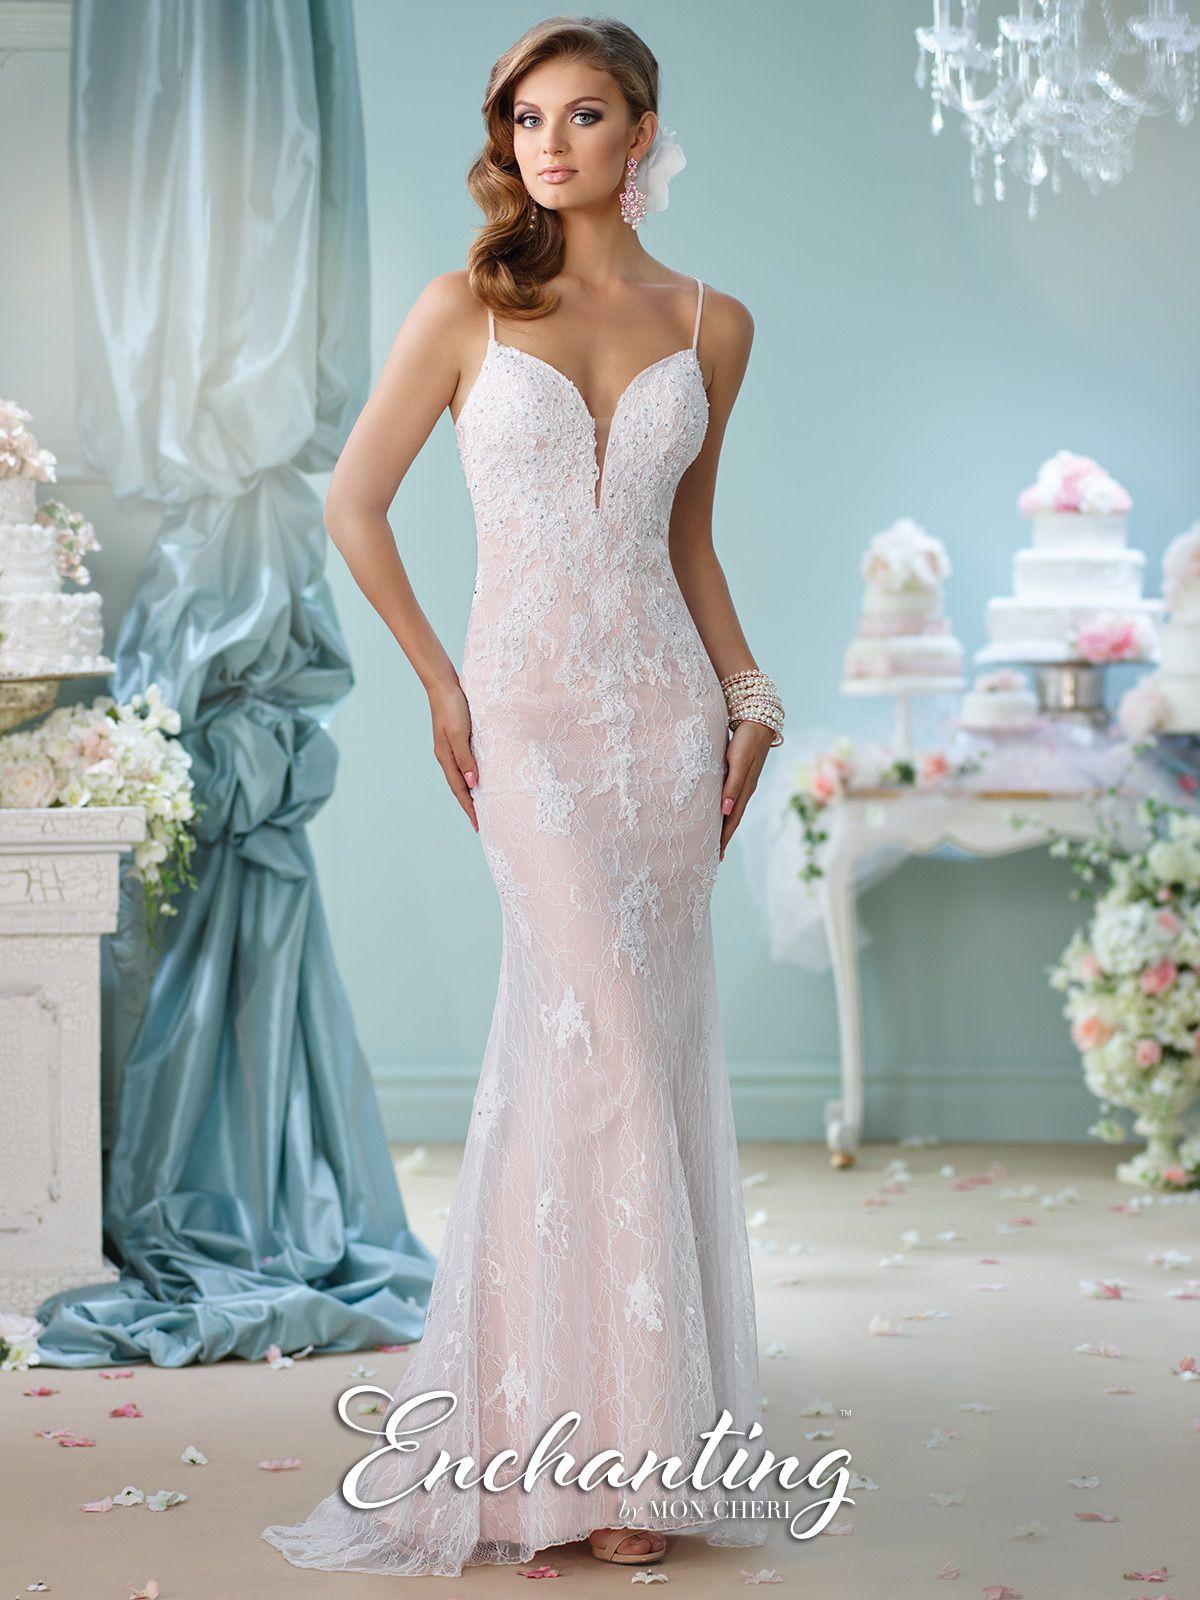 Unique Wedding Dresses Spring 2018 - Martin Thornburg   Vestidos ...